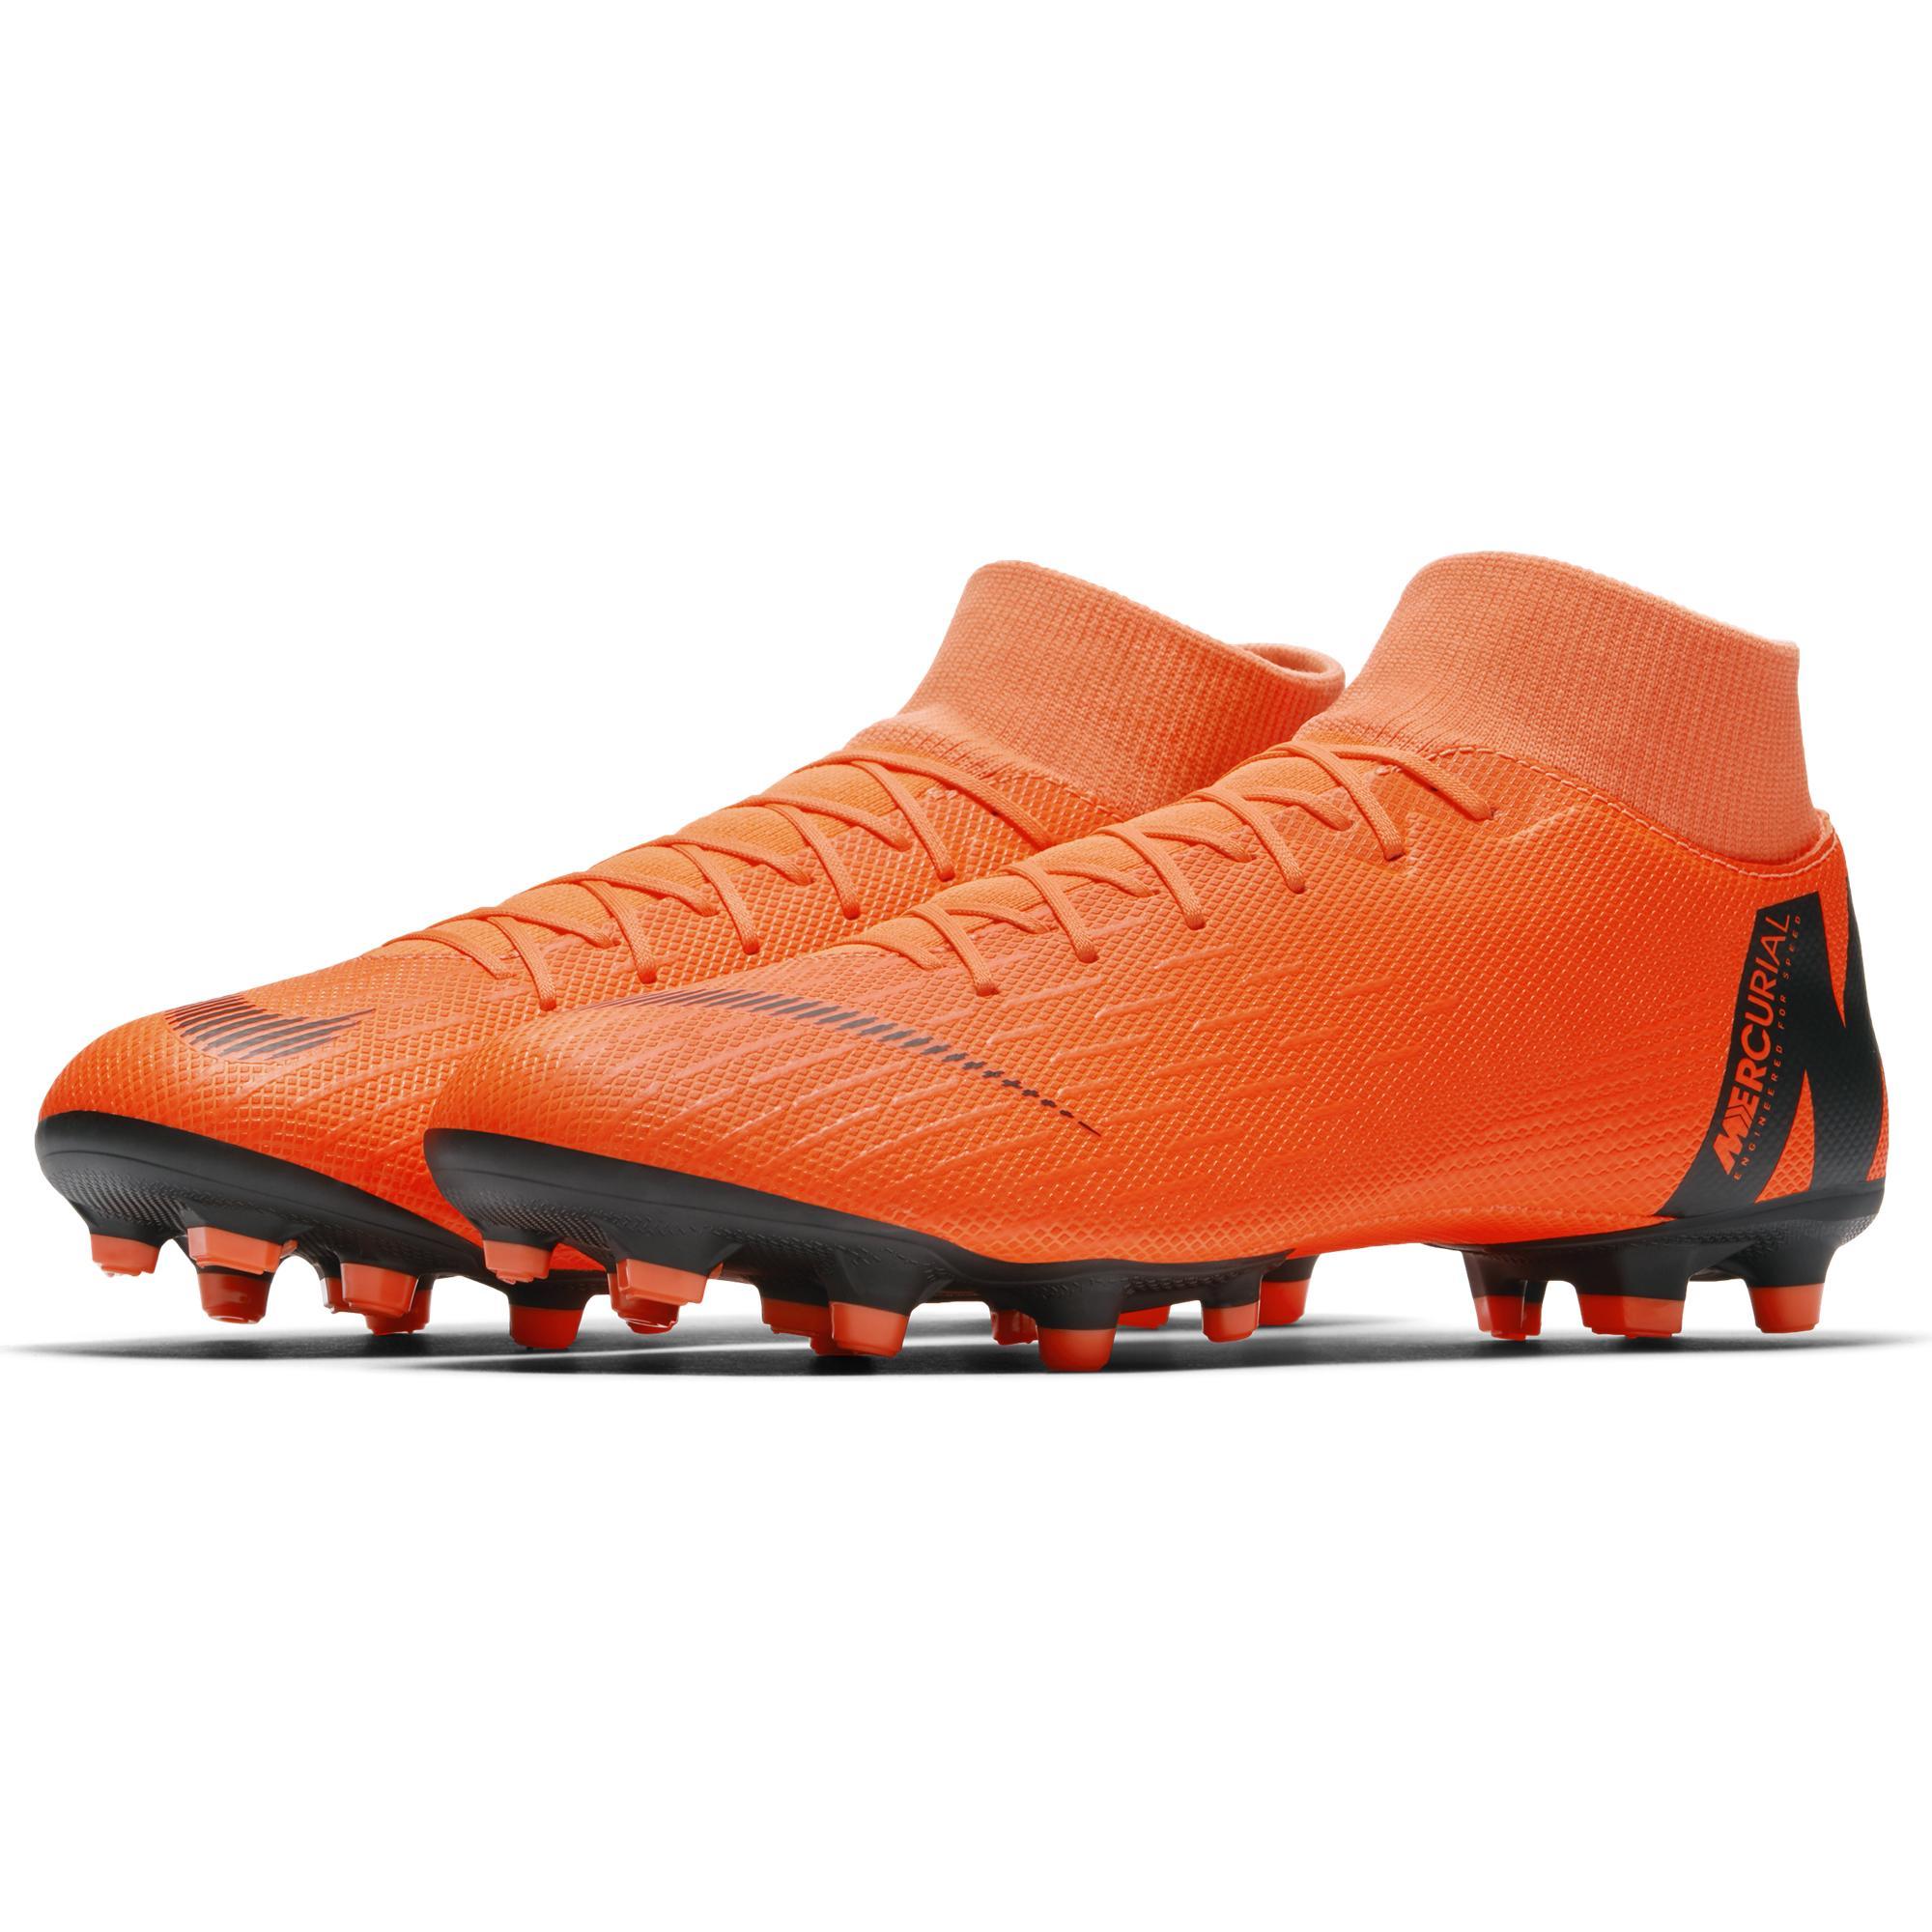 uk availability c1847 3b72f Nike Football Shoes SUPERFLY 6 ACADEMY FG/MG